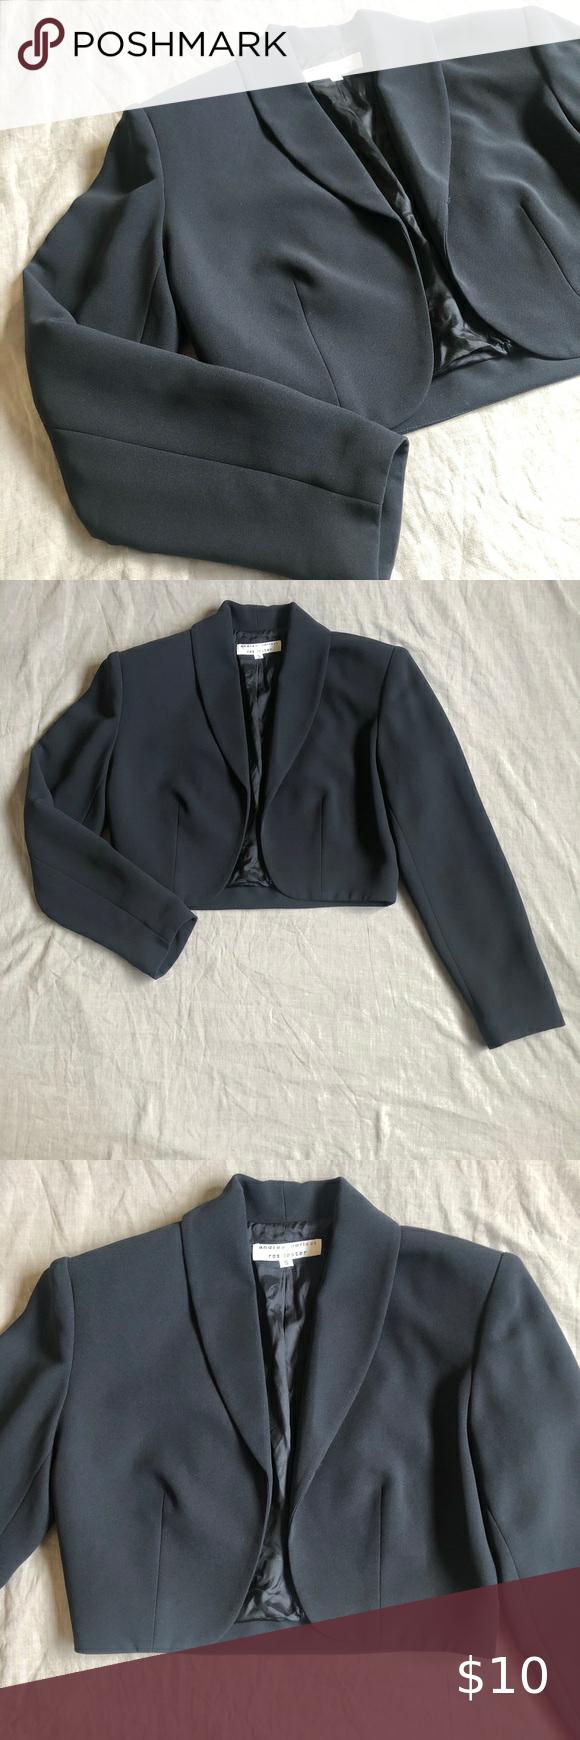 Cropped Black Dress Jacket Size Small Andrea Polizzi For Rex Lester Vintage Cropped Dress Jacket I Got This At A Jacket Dress Black Dress Jacket Black Dress [ 1740 x 580 Pixel ]